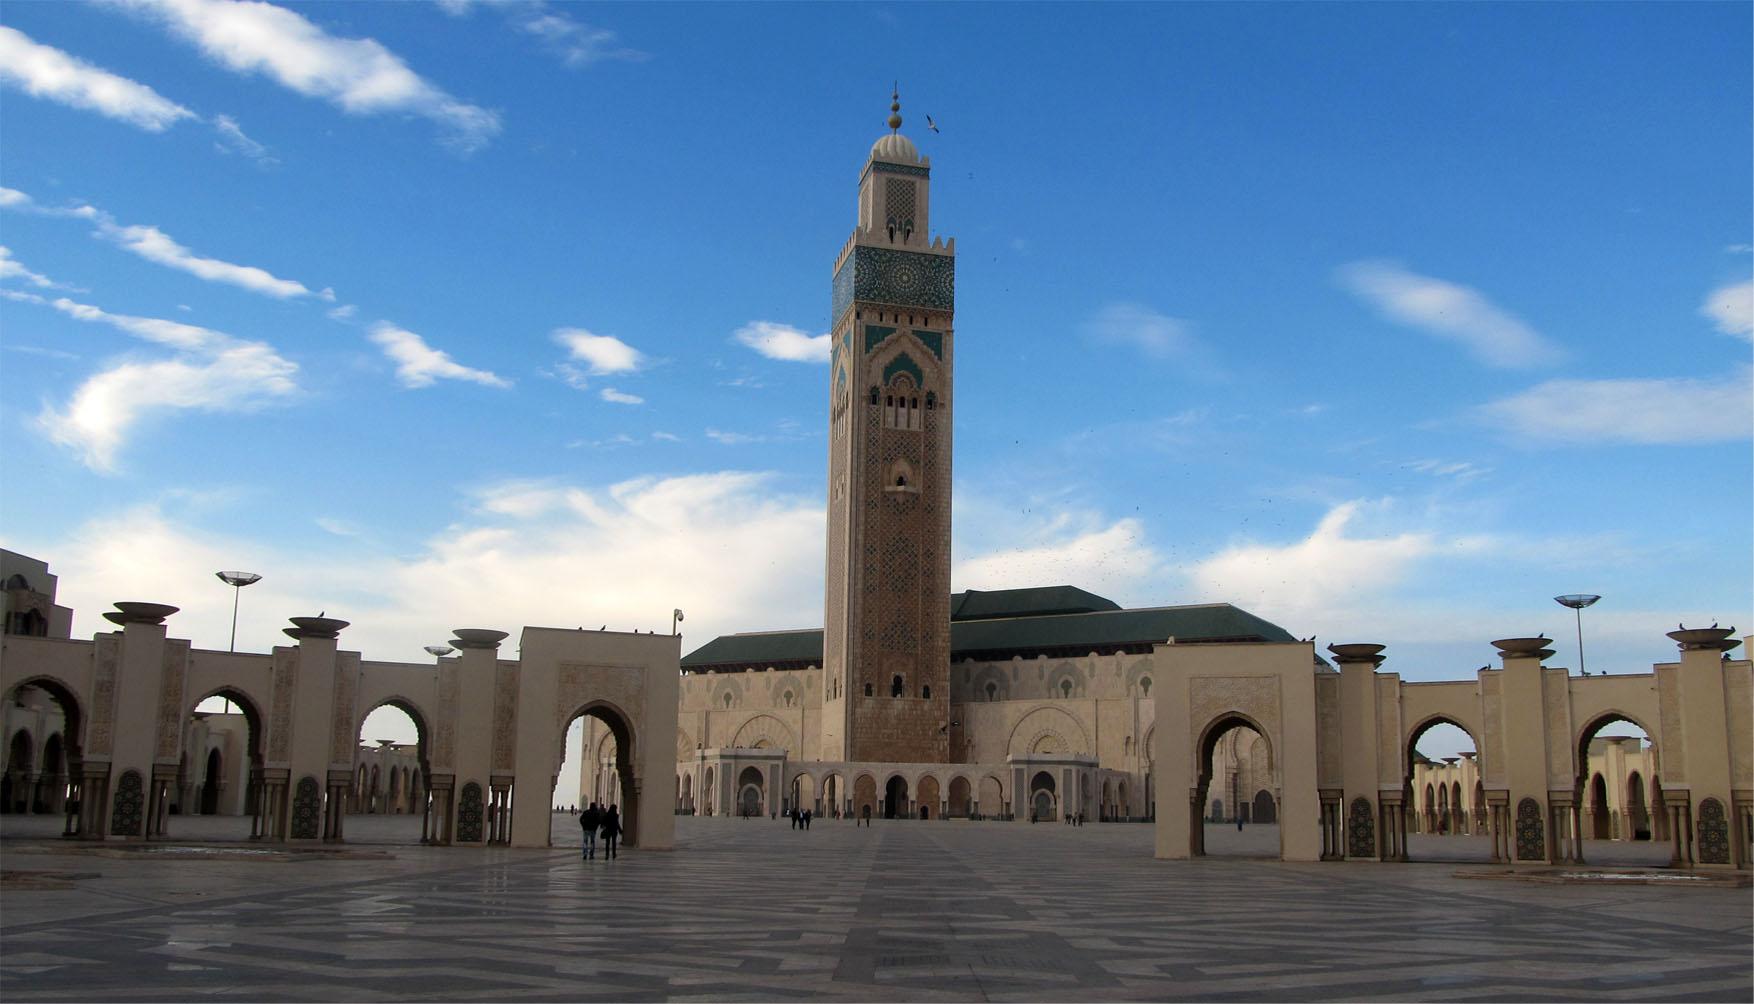 82 maroko kazablanka velika dzamija